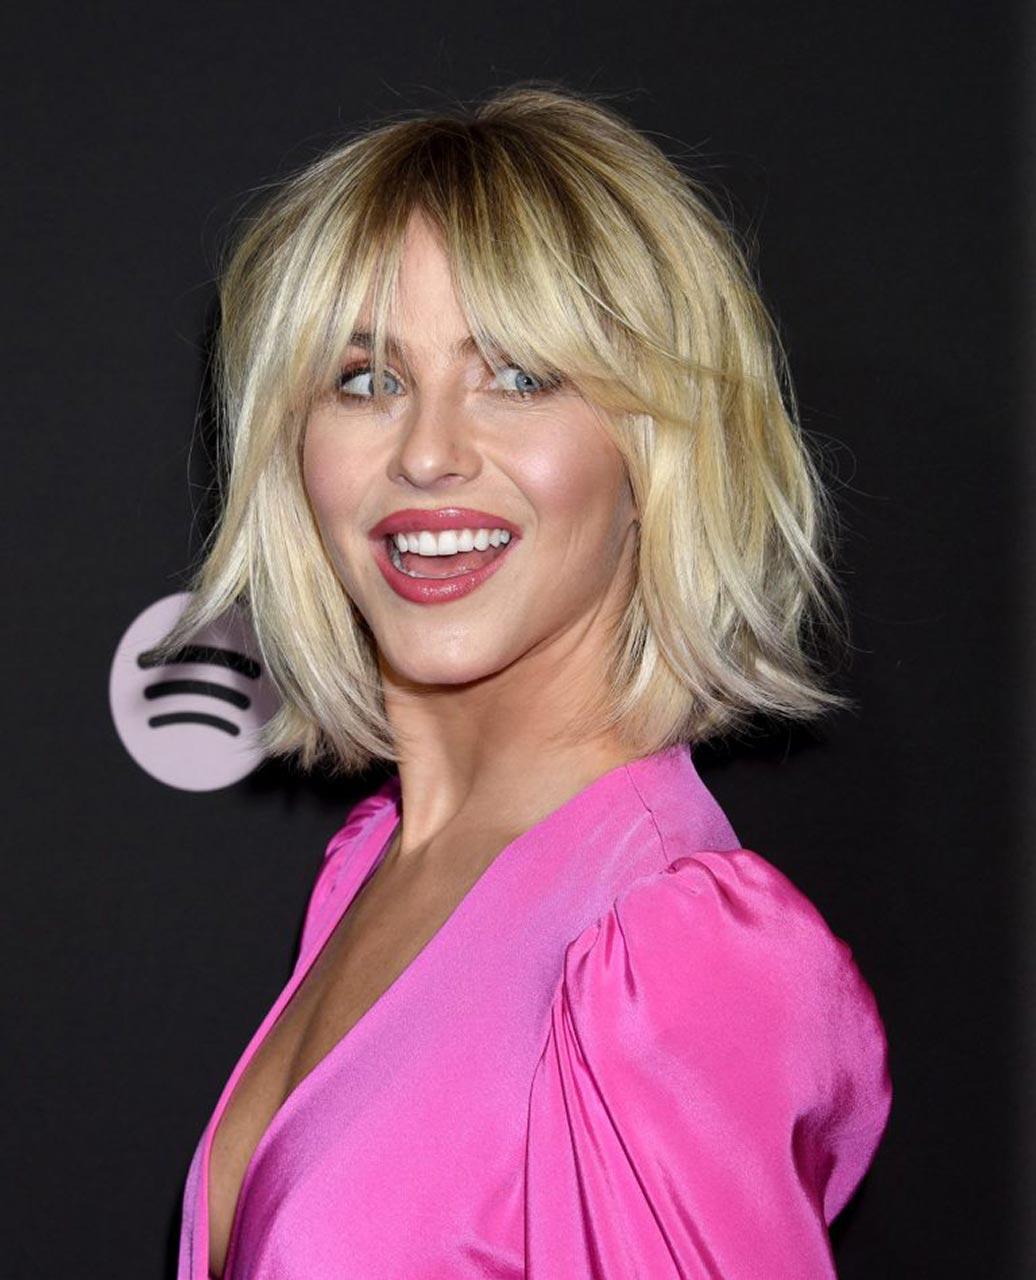 Julianne Hough Braless for Spotify Awards  Scandal Planet